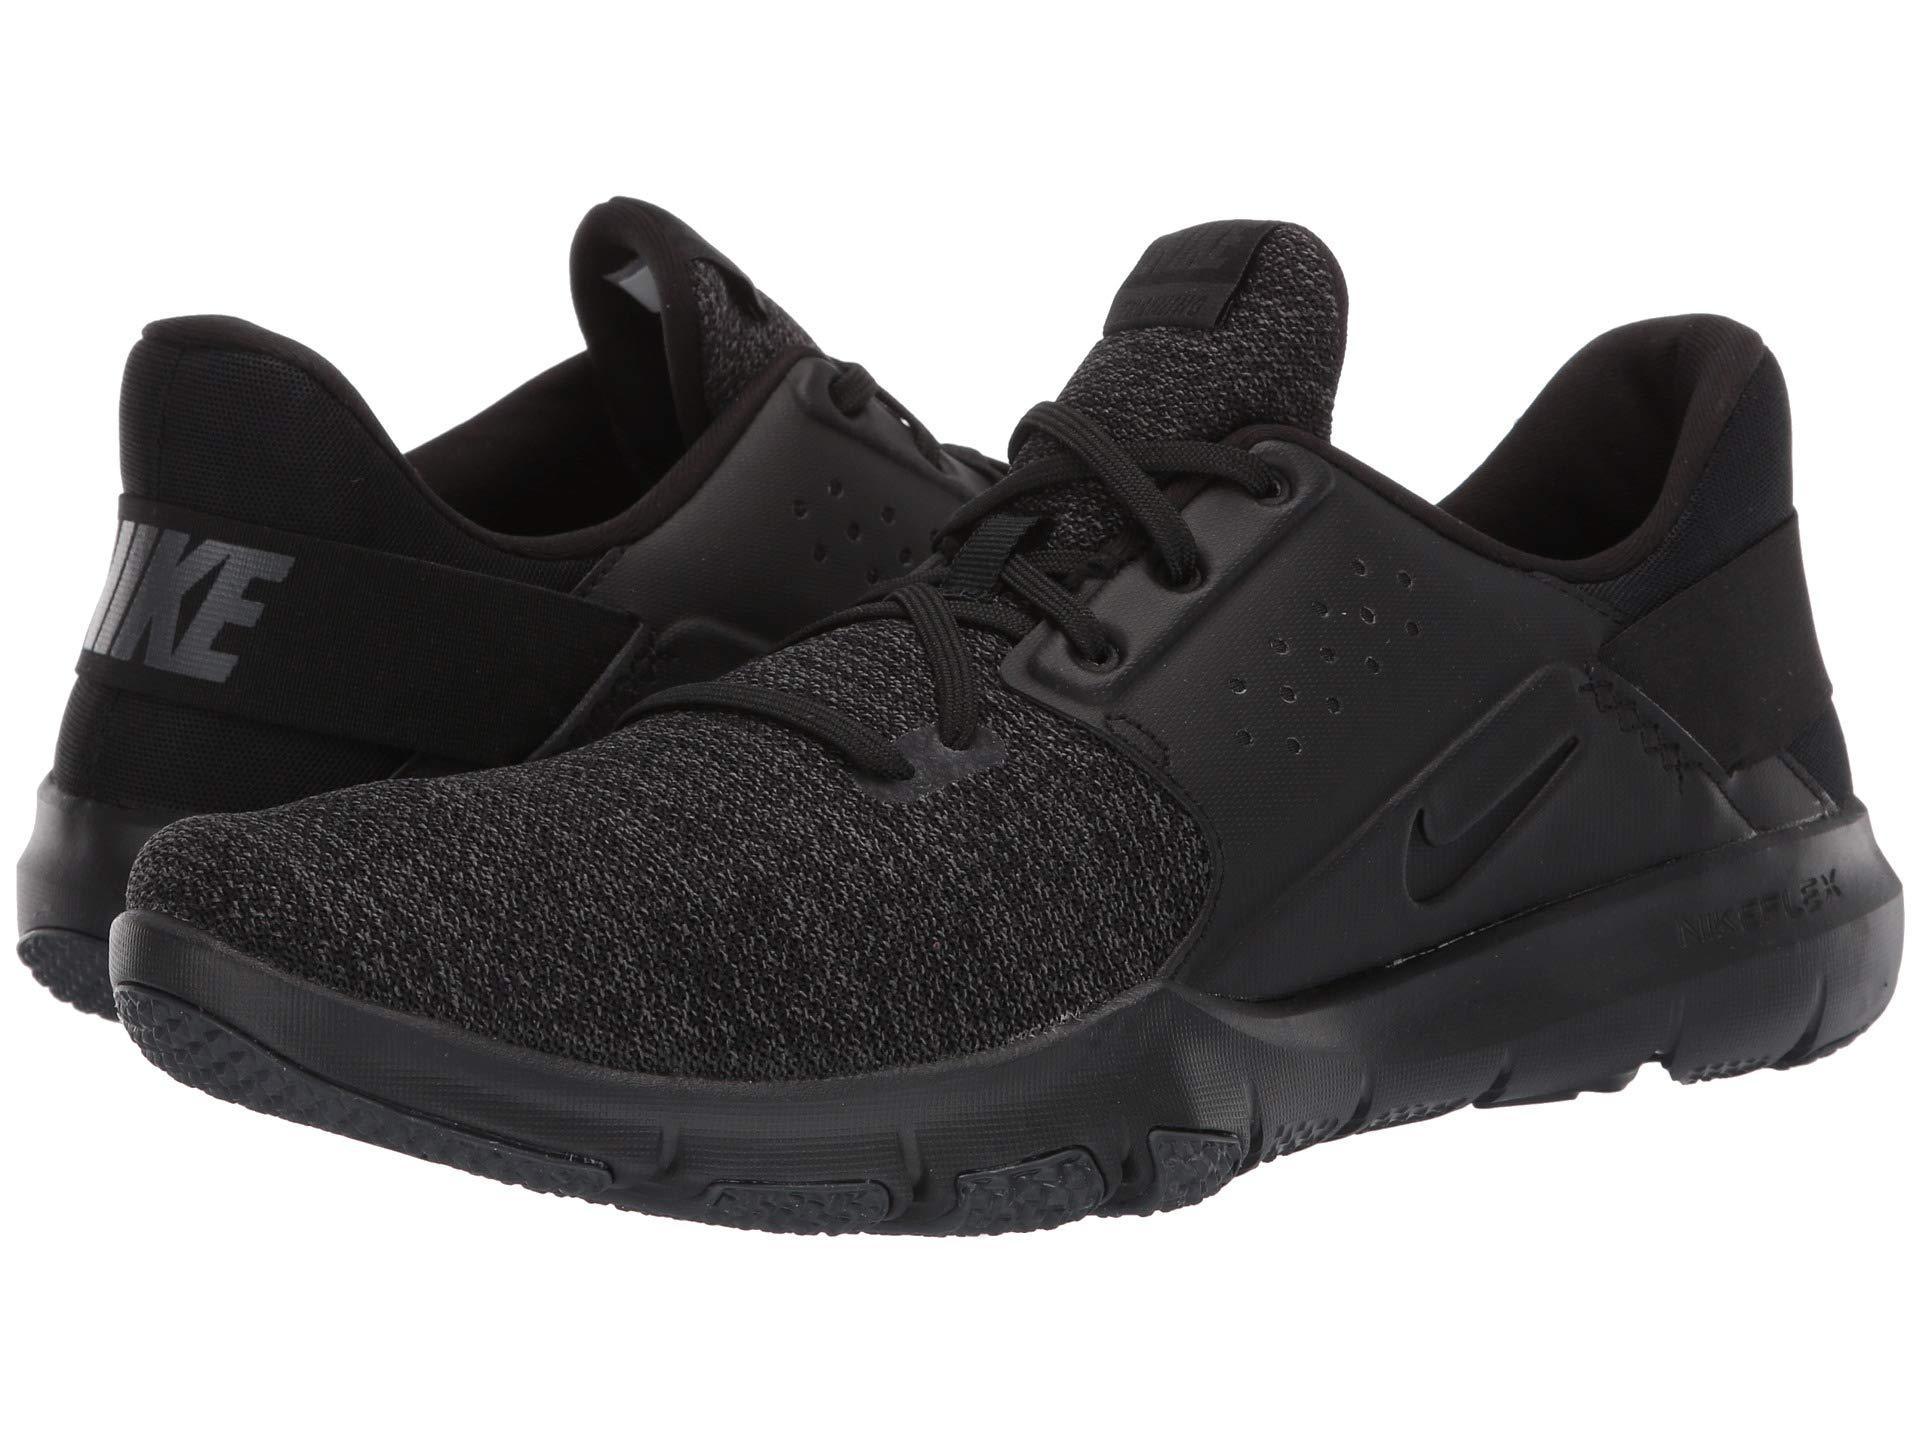 on sale 03fa7 2426d Nike Flex Control 3 (atmosphere Grey game Royal vast Grey) Men s ...